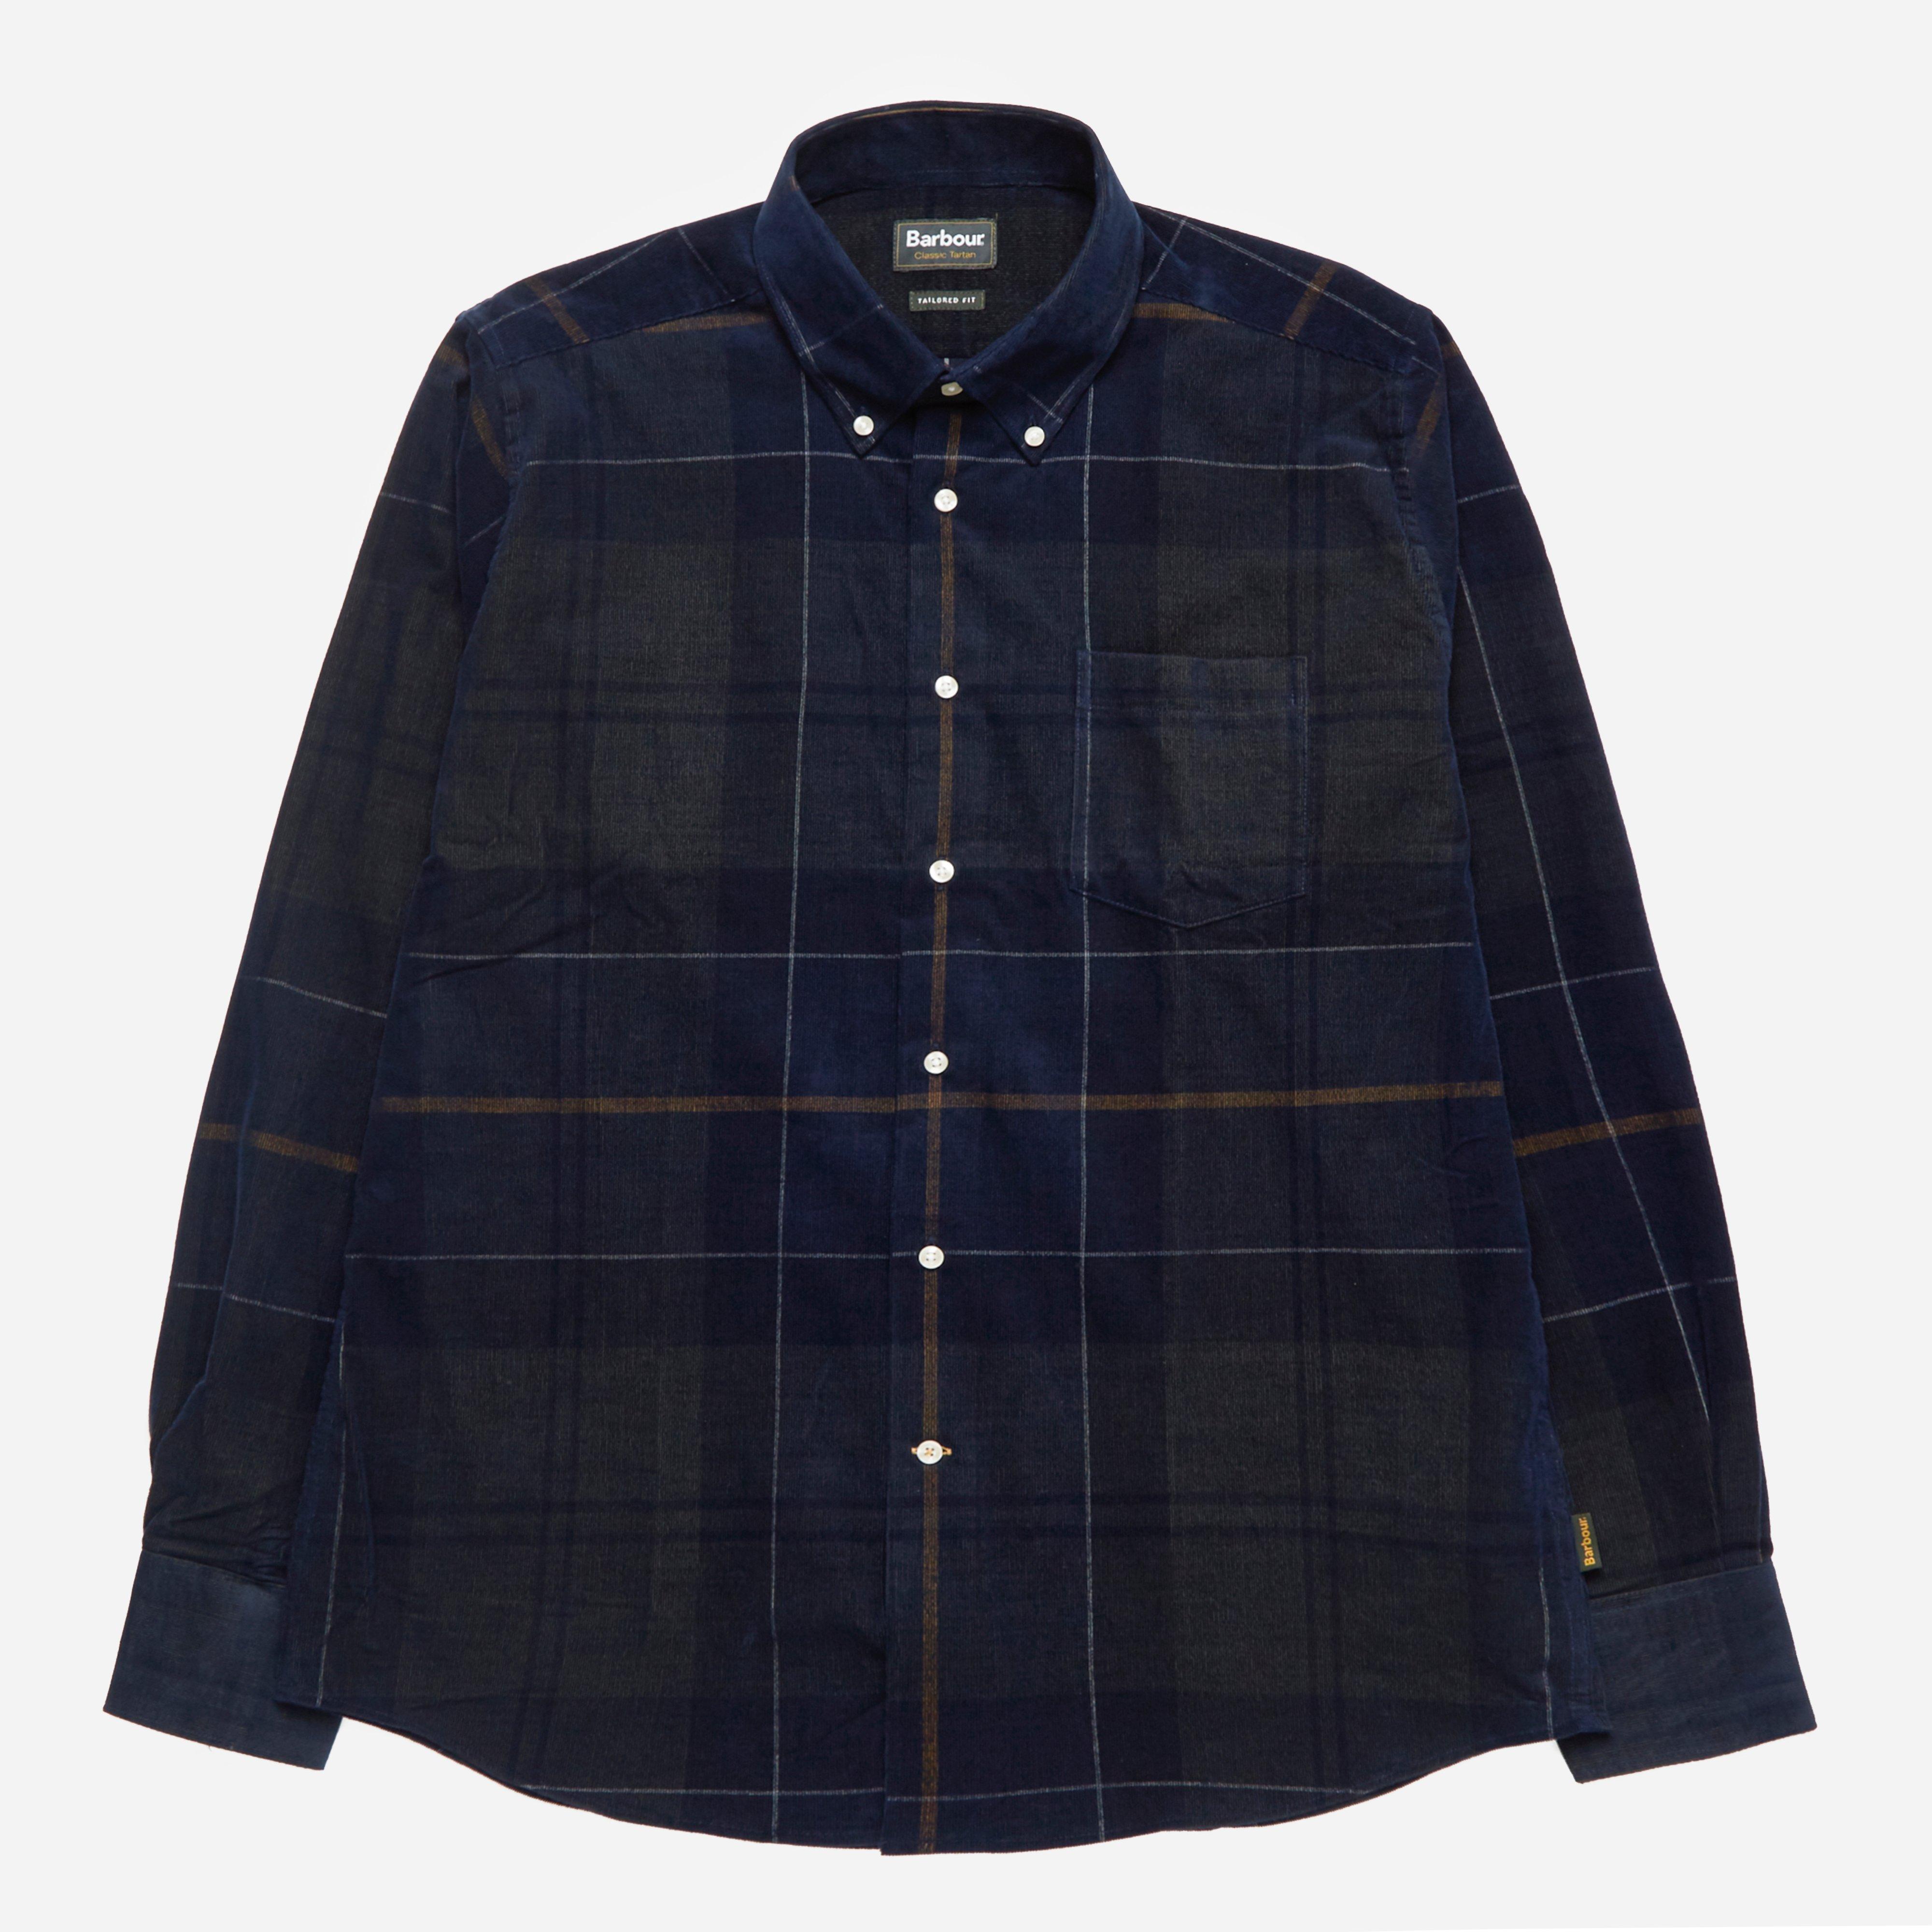 Barbour Nauton Shirt